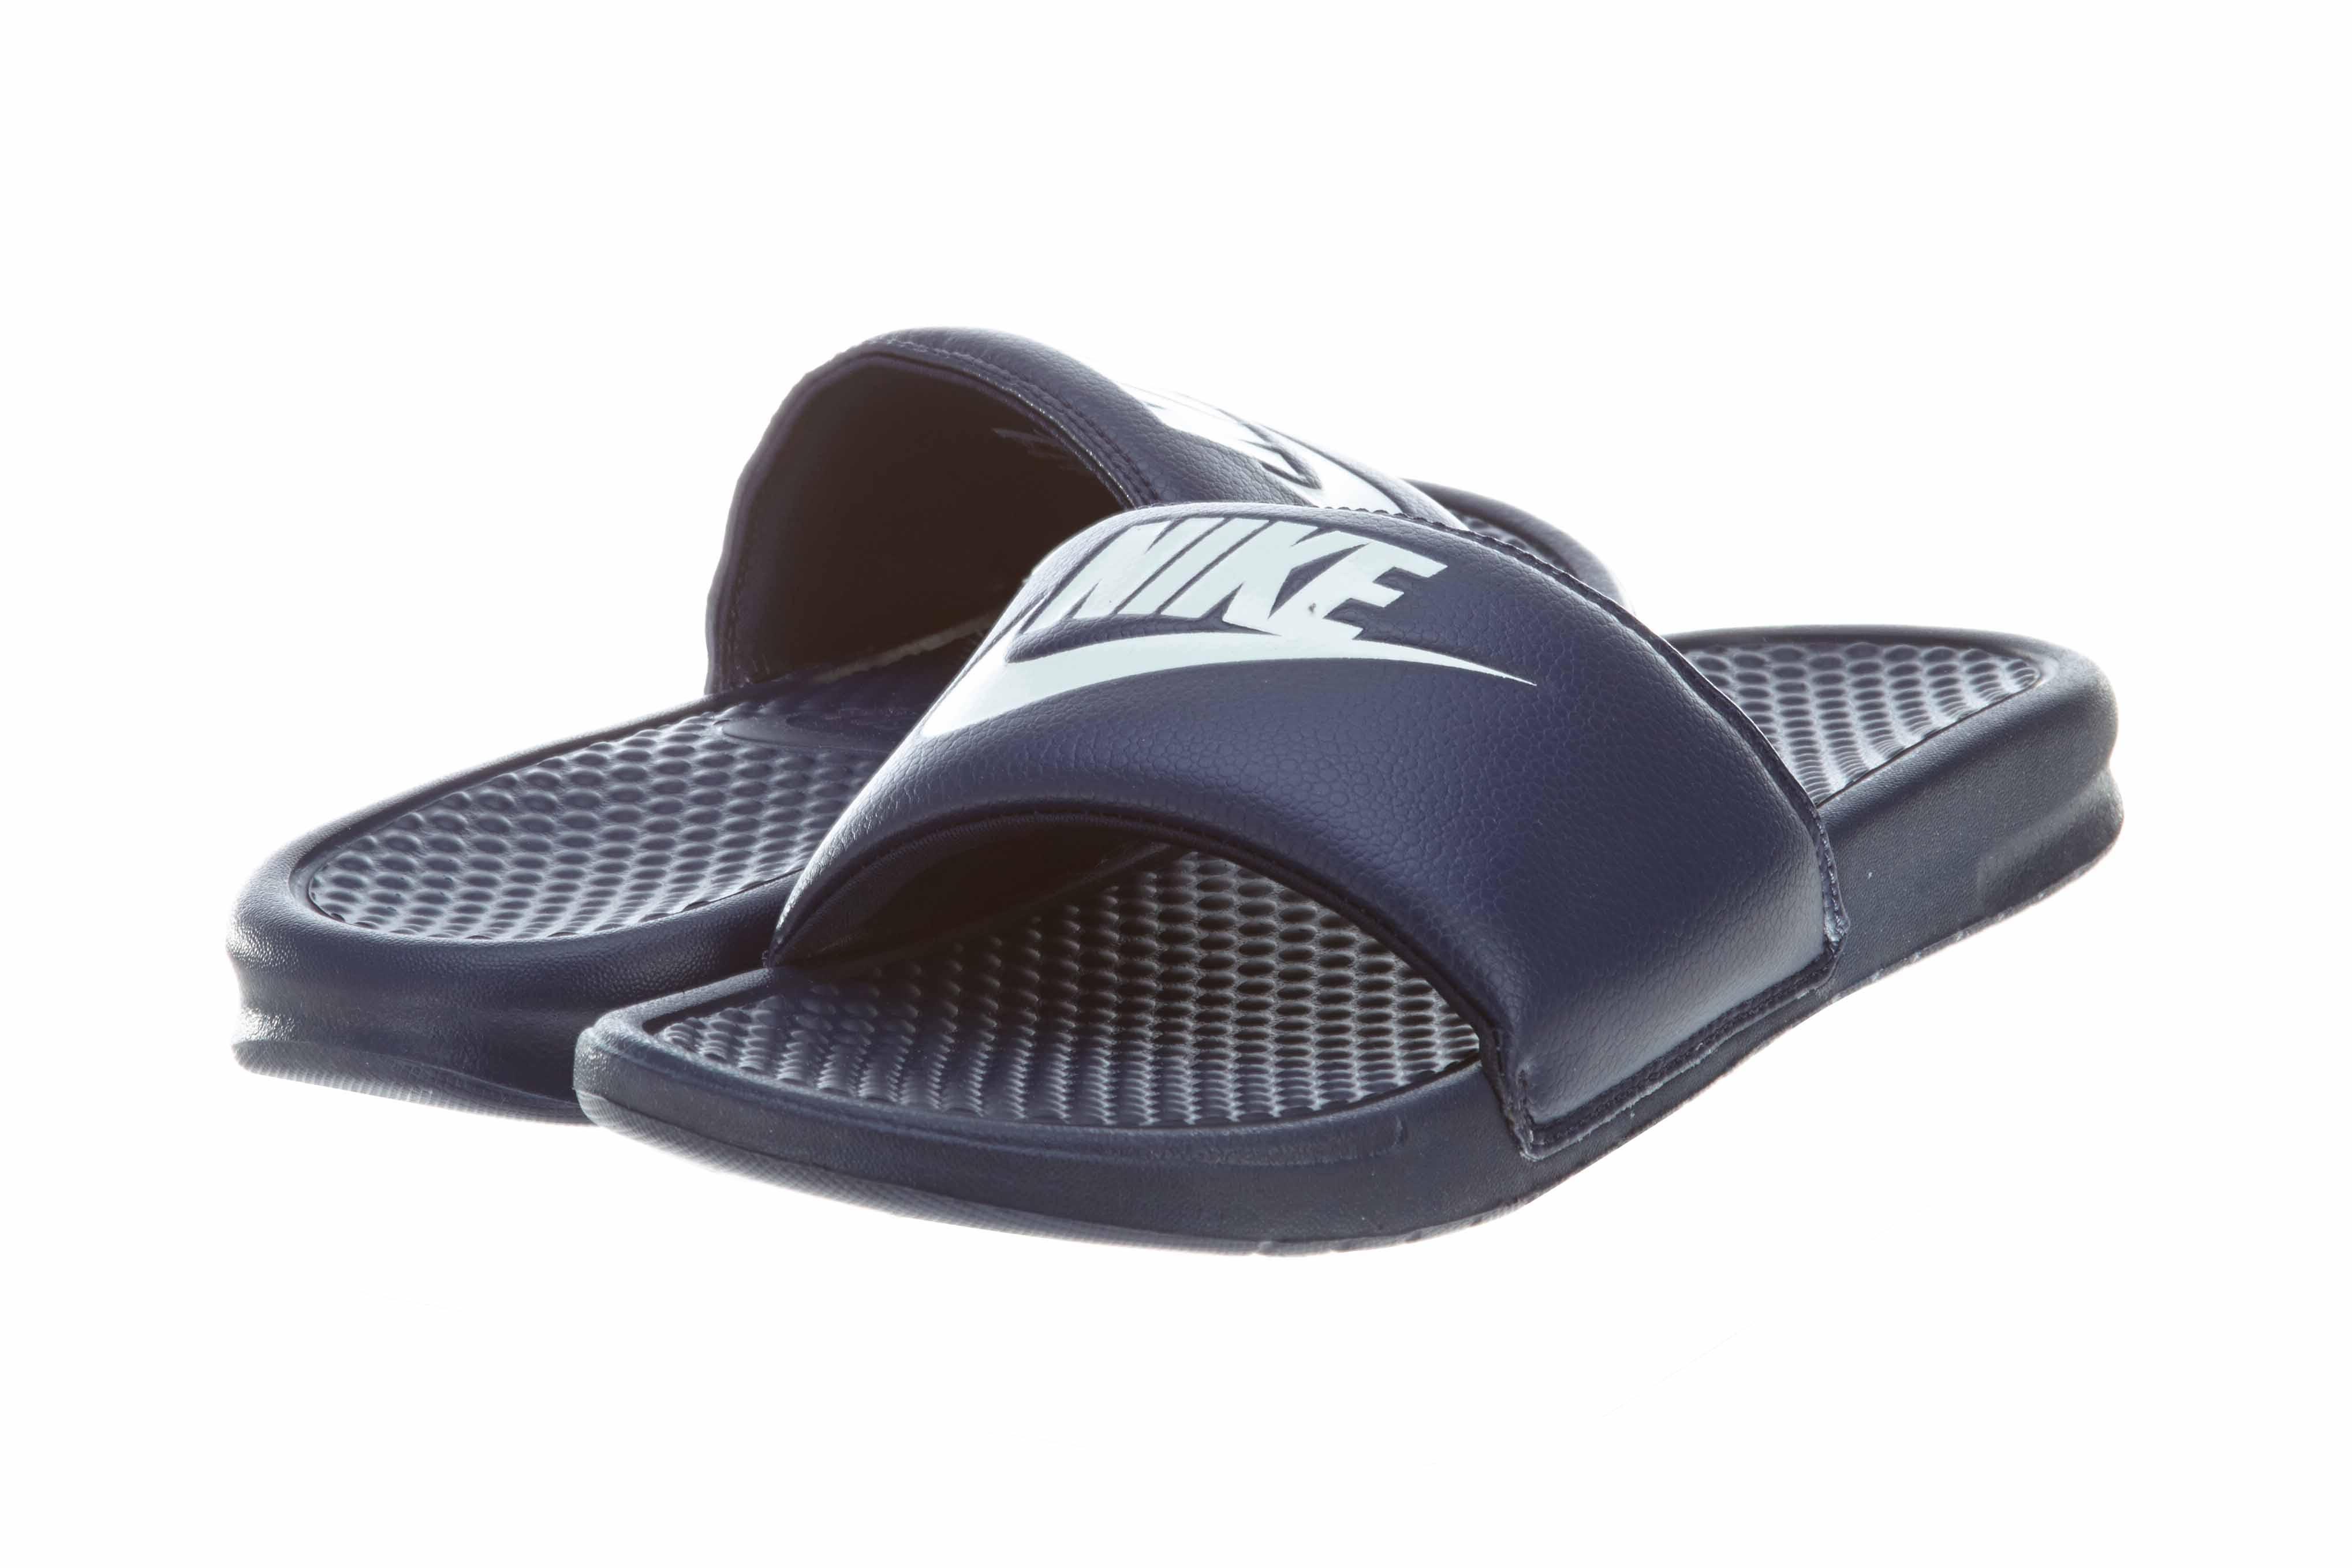 Benassi Tamaño 343880403 Slide Nike Hombre 5 Jdi 0qdZ7wC